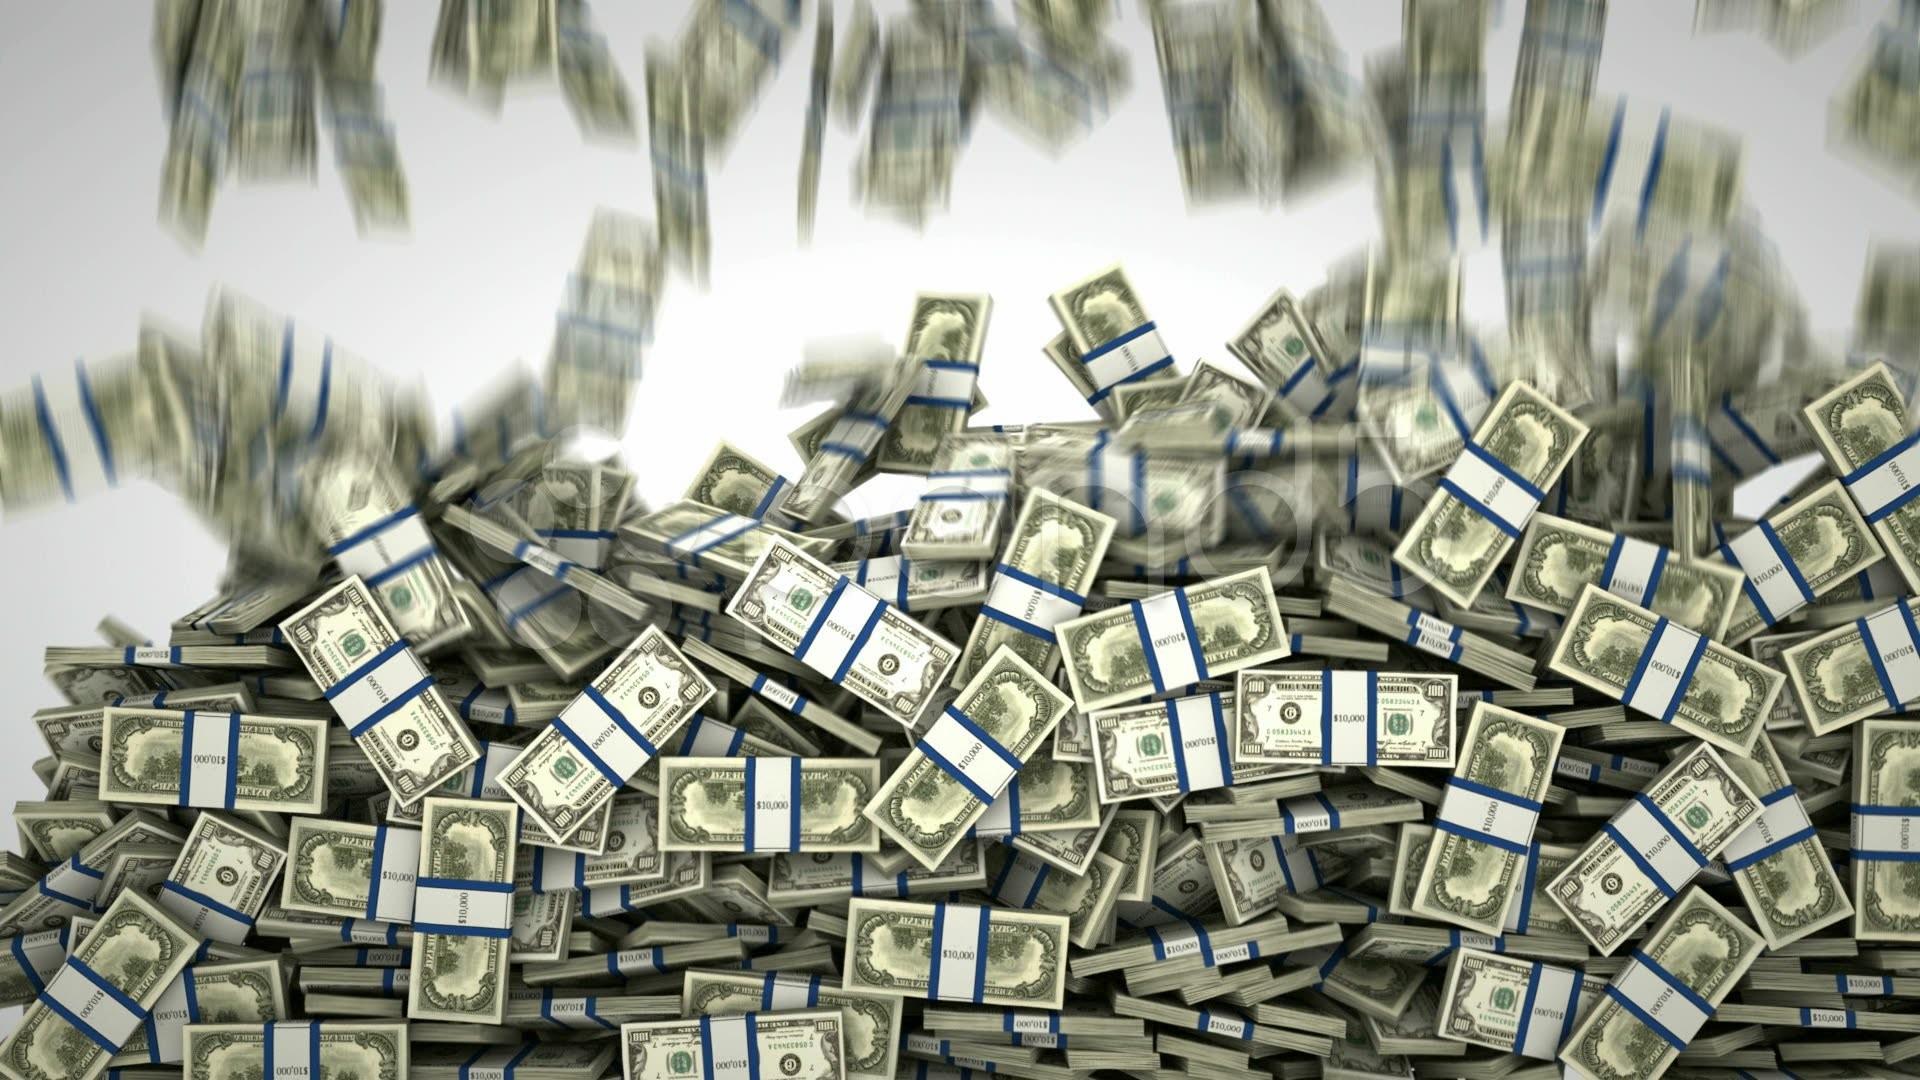 … falling money live wallpaper wallpapersafari; wealth wallpapers high  quality download free …